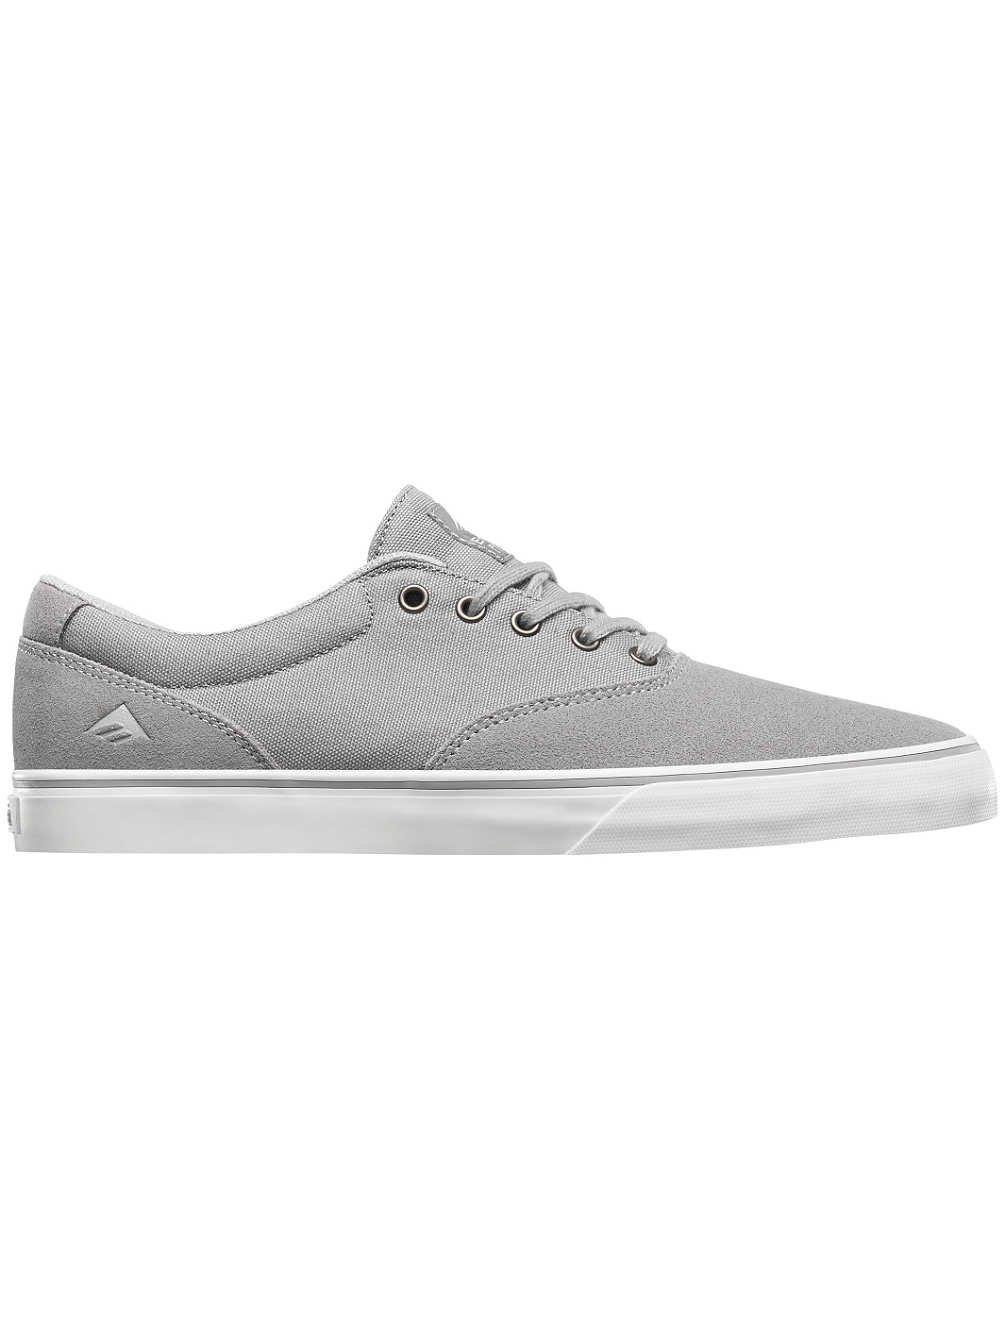 Emerica Provost Slim Vulc Skate Shoe,Grey,5 M US